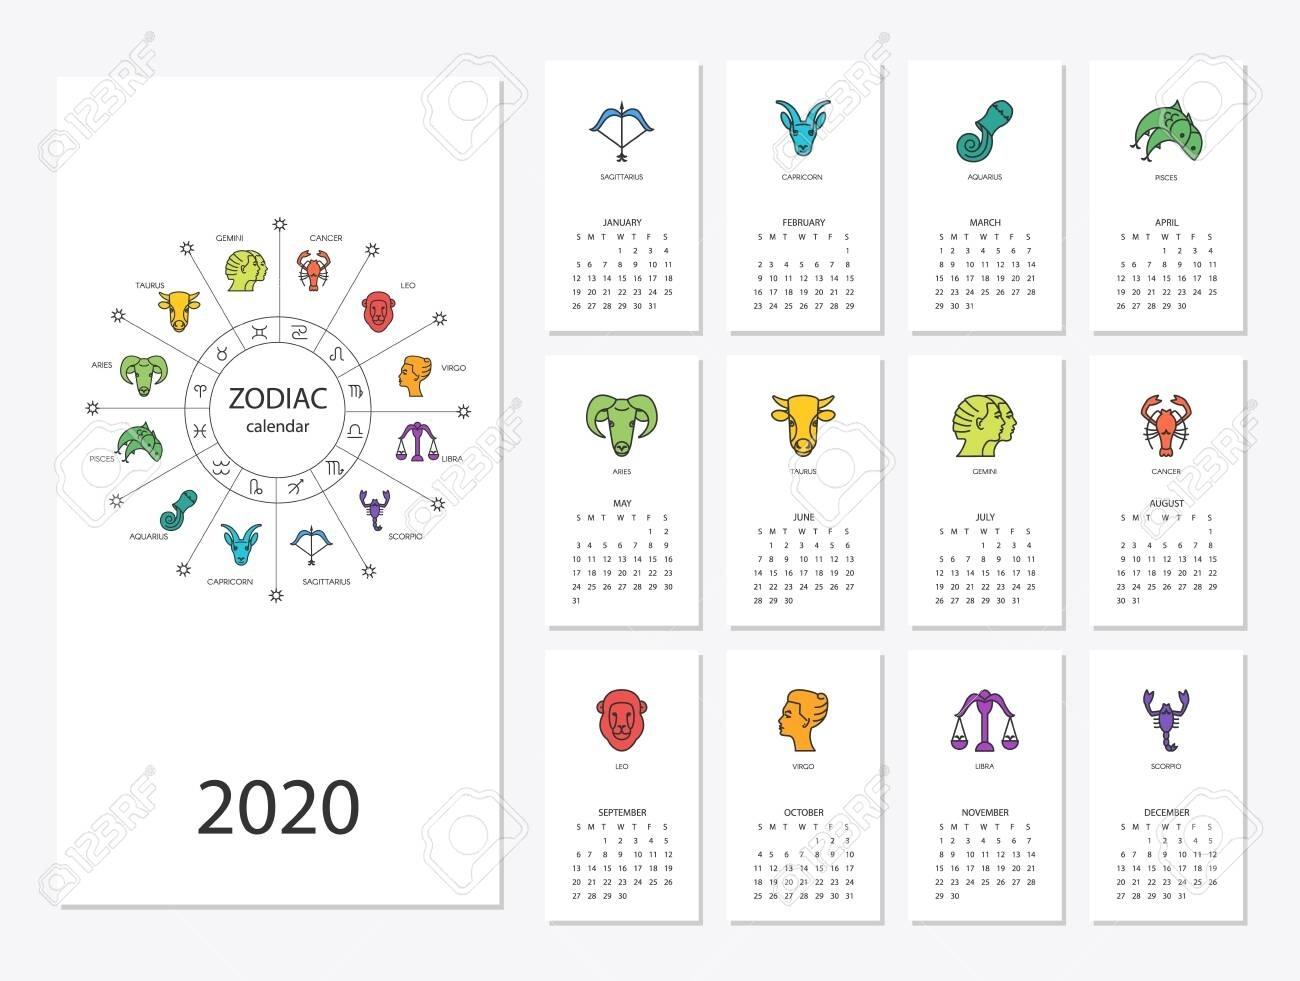 Calendar 2020 With Horoscope Signs Zodiac Symbols Set Zodiac Calendar 13 Signs